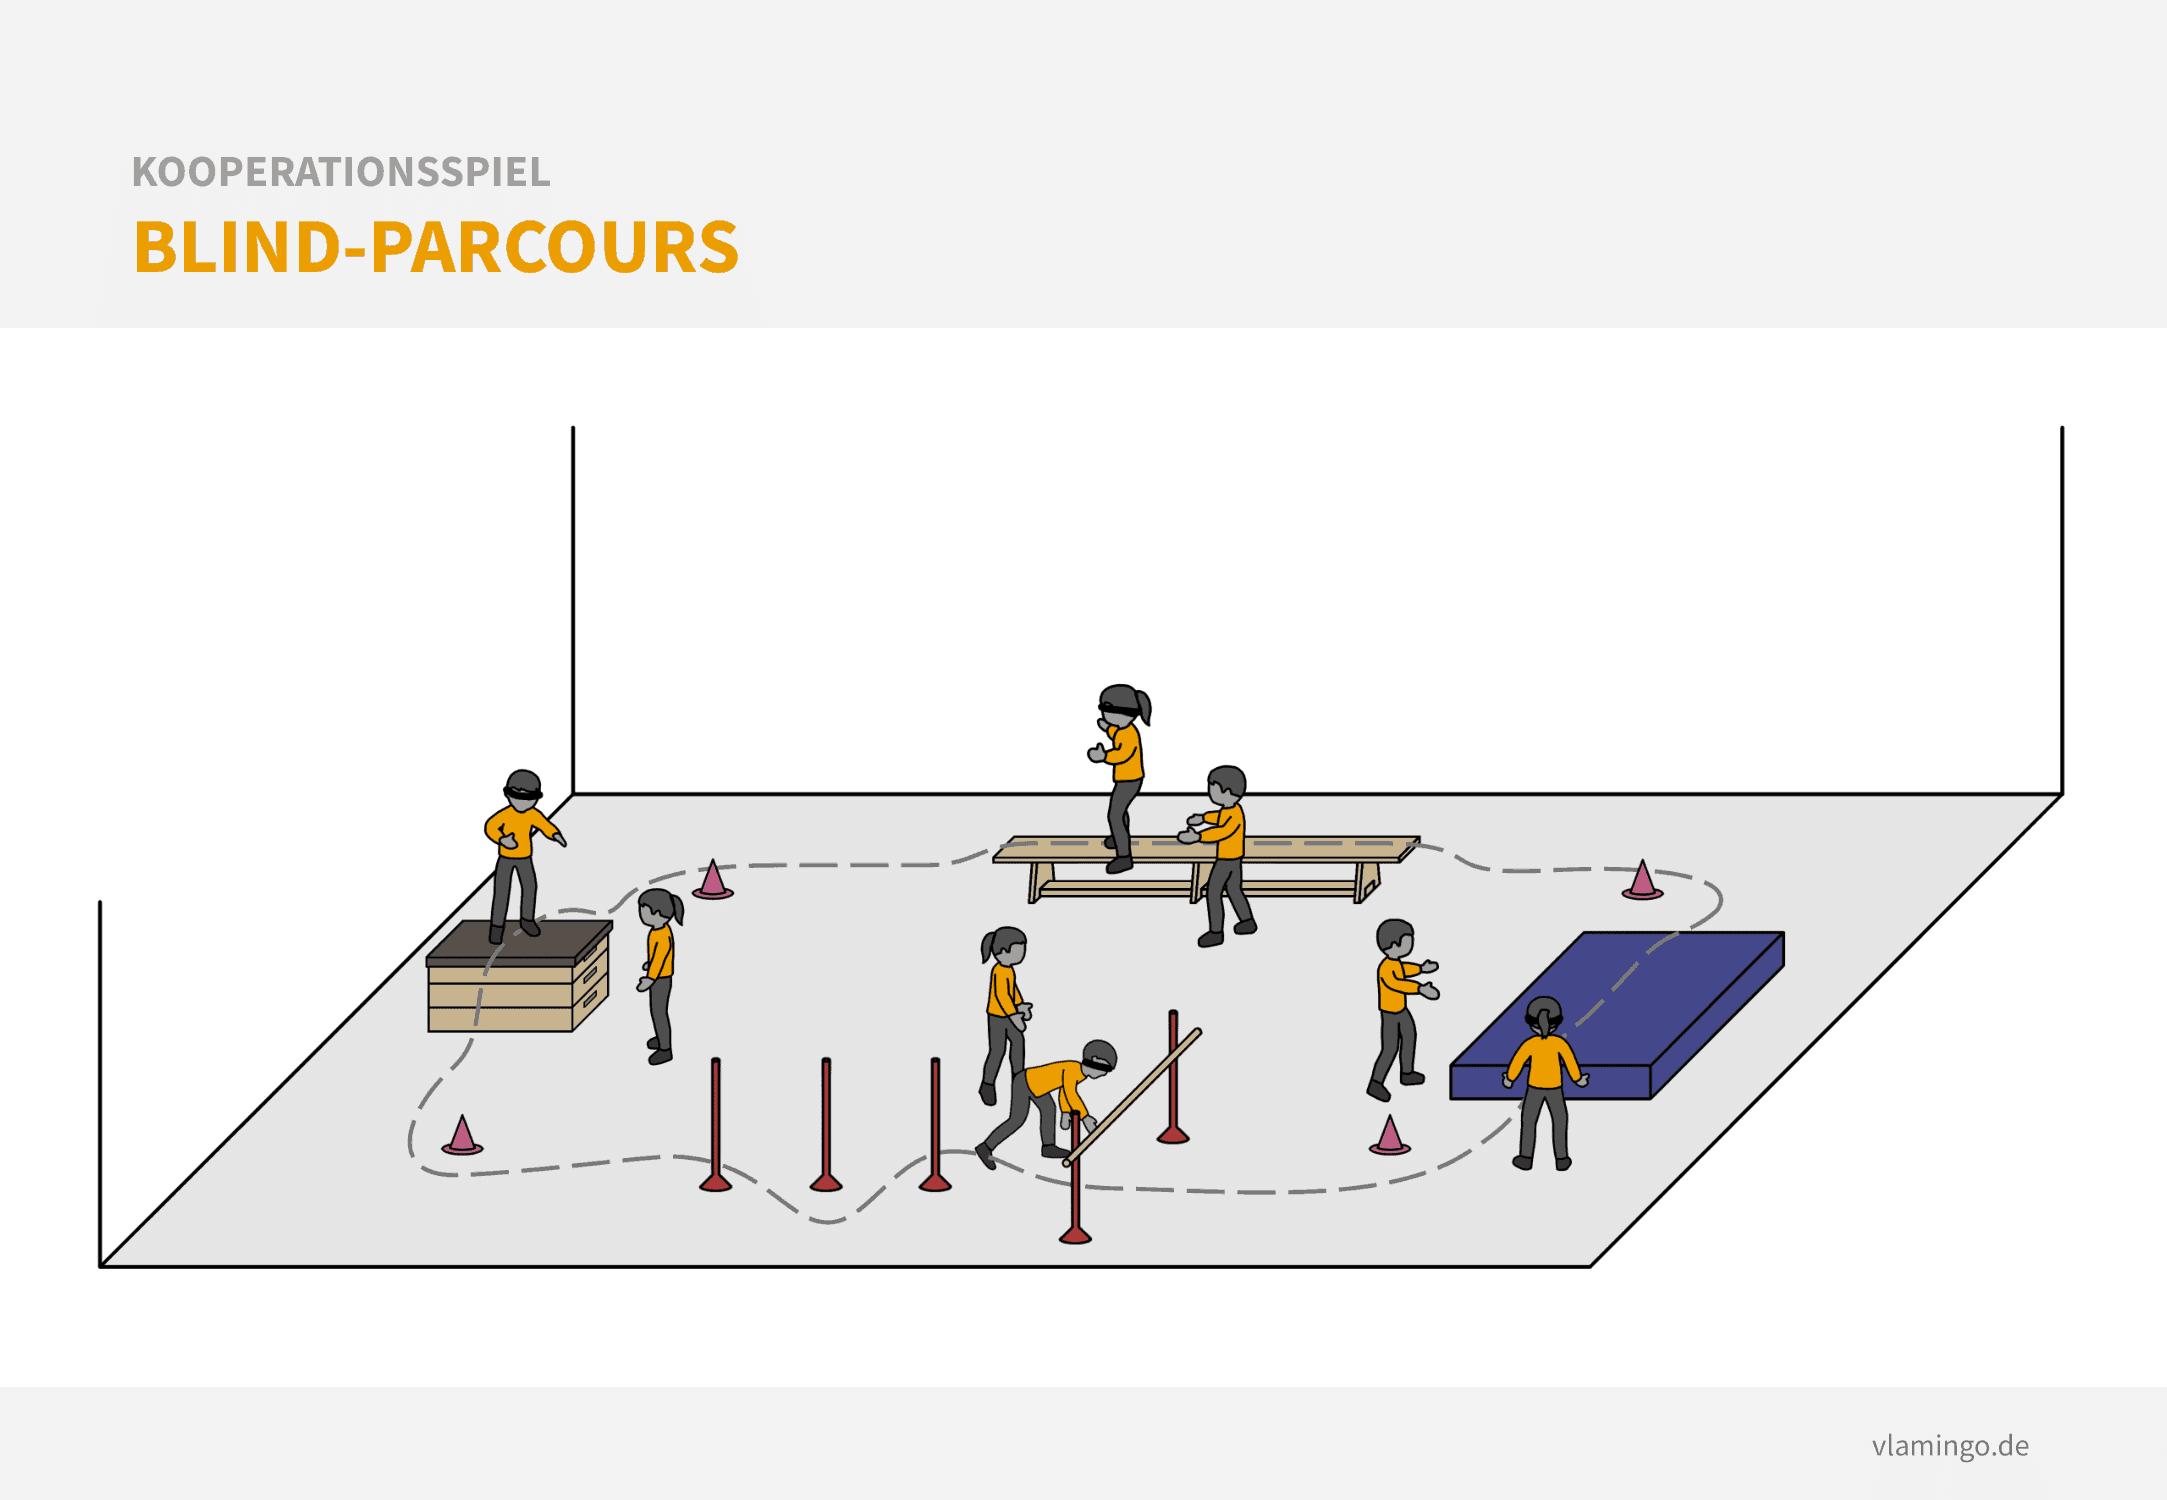 Kooperationsspiel: Blind-Parcours